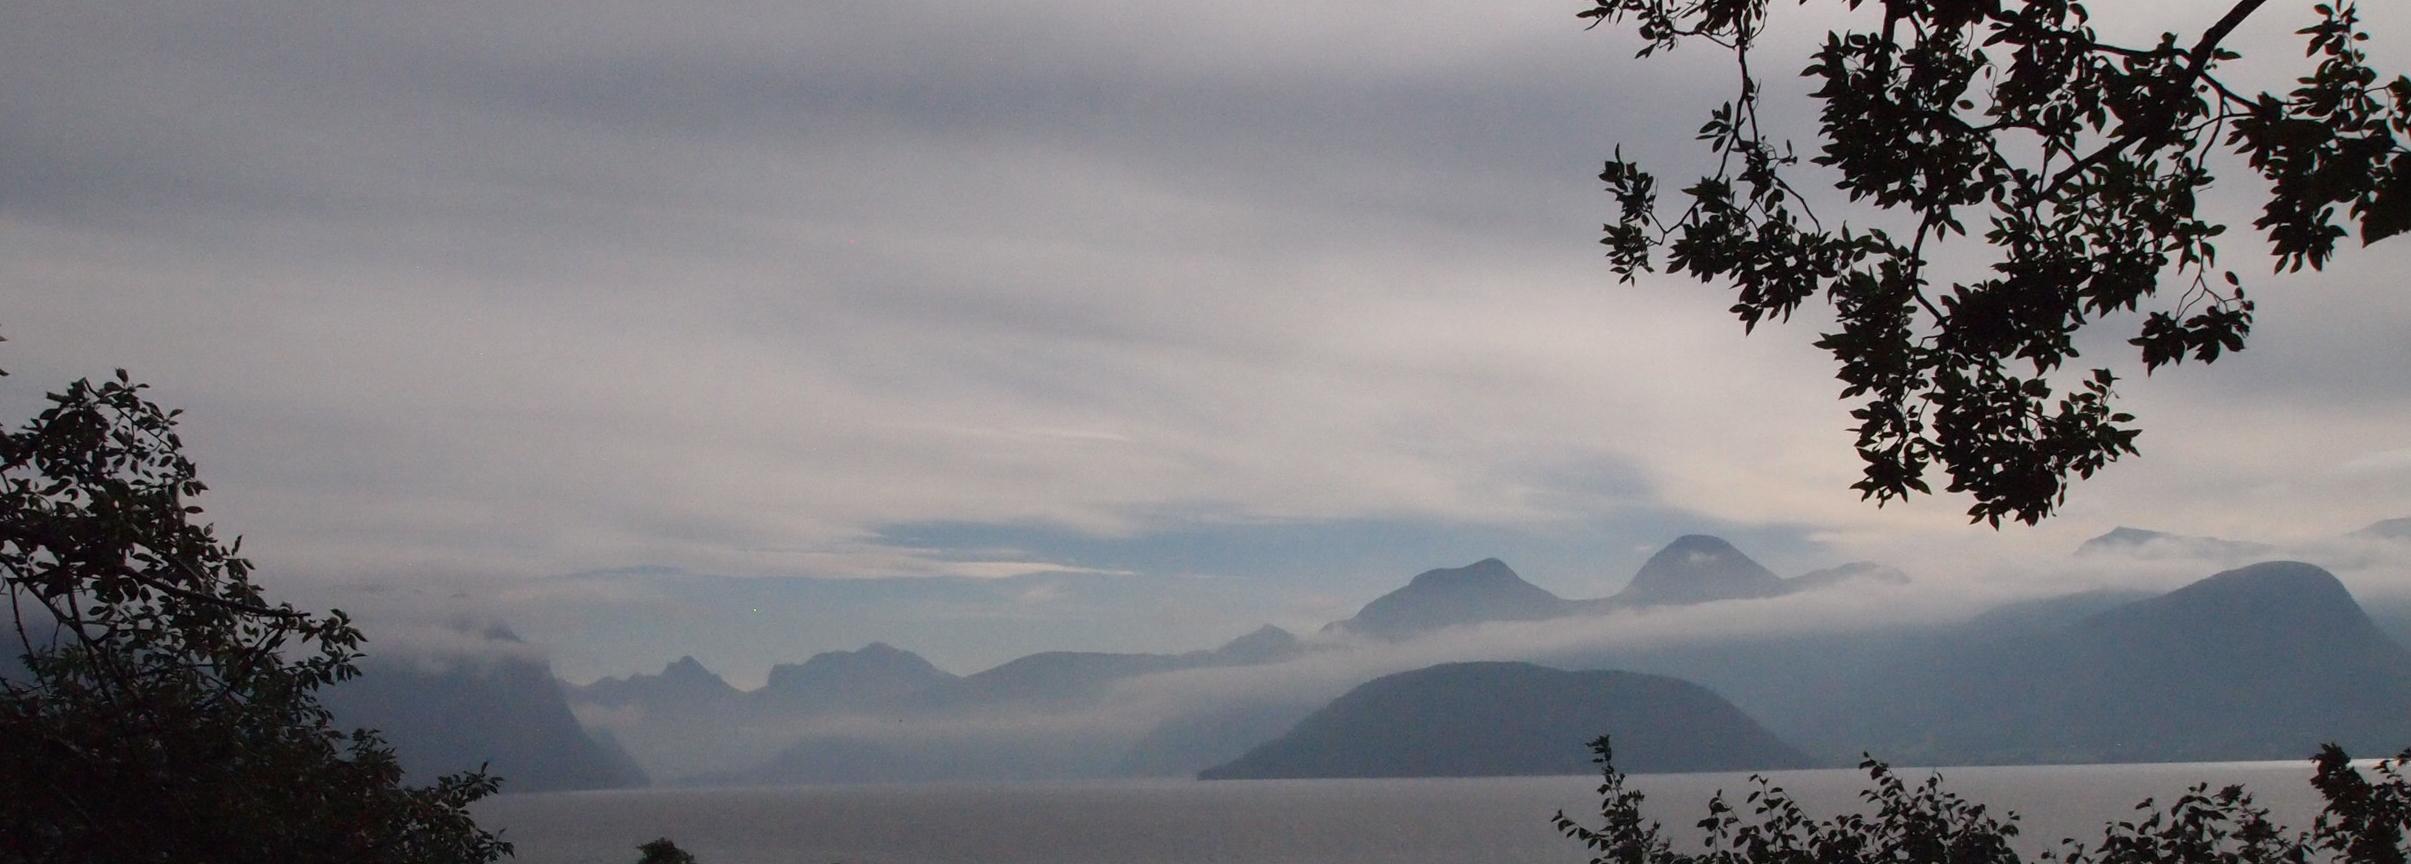 View from Sekken Island